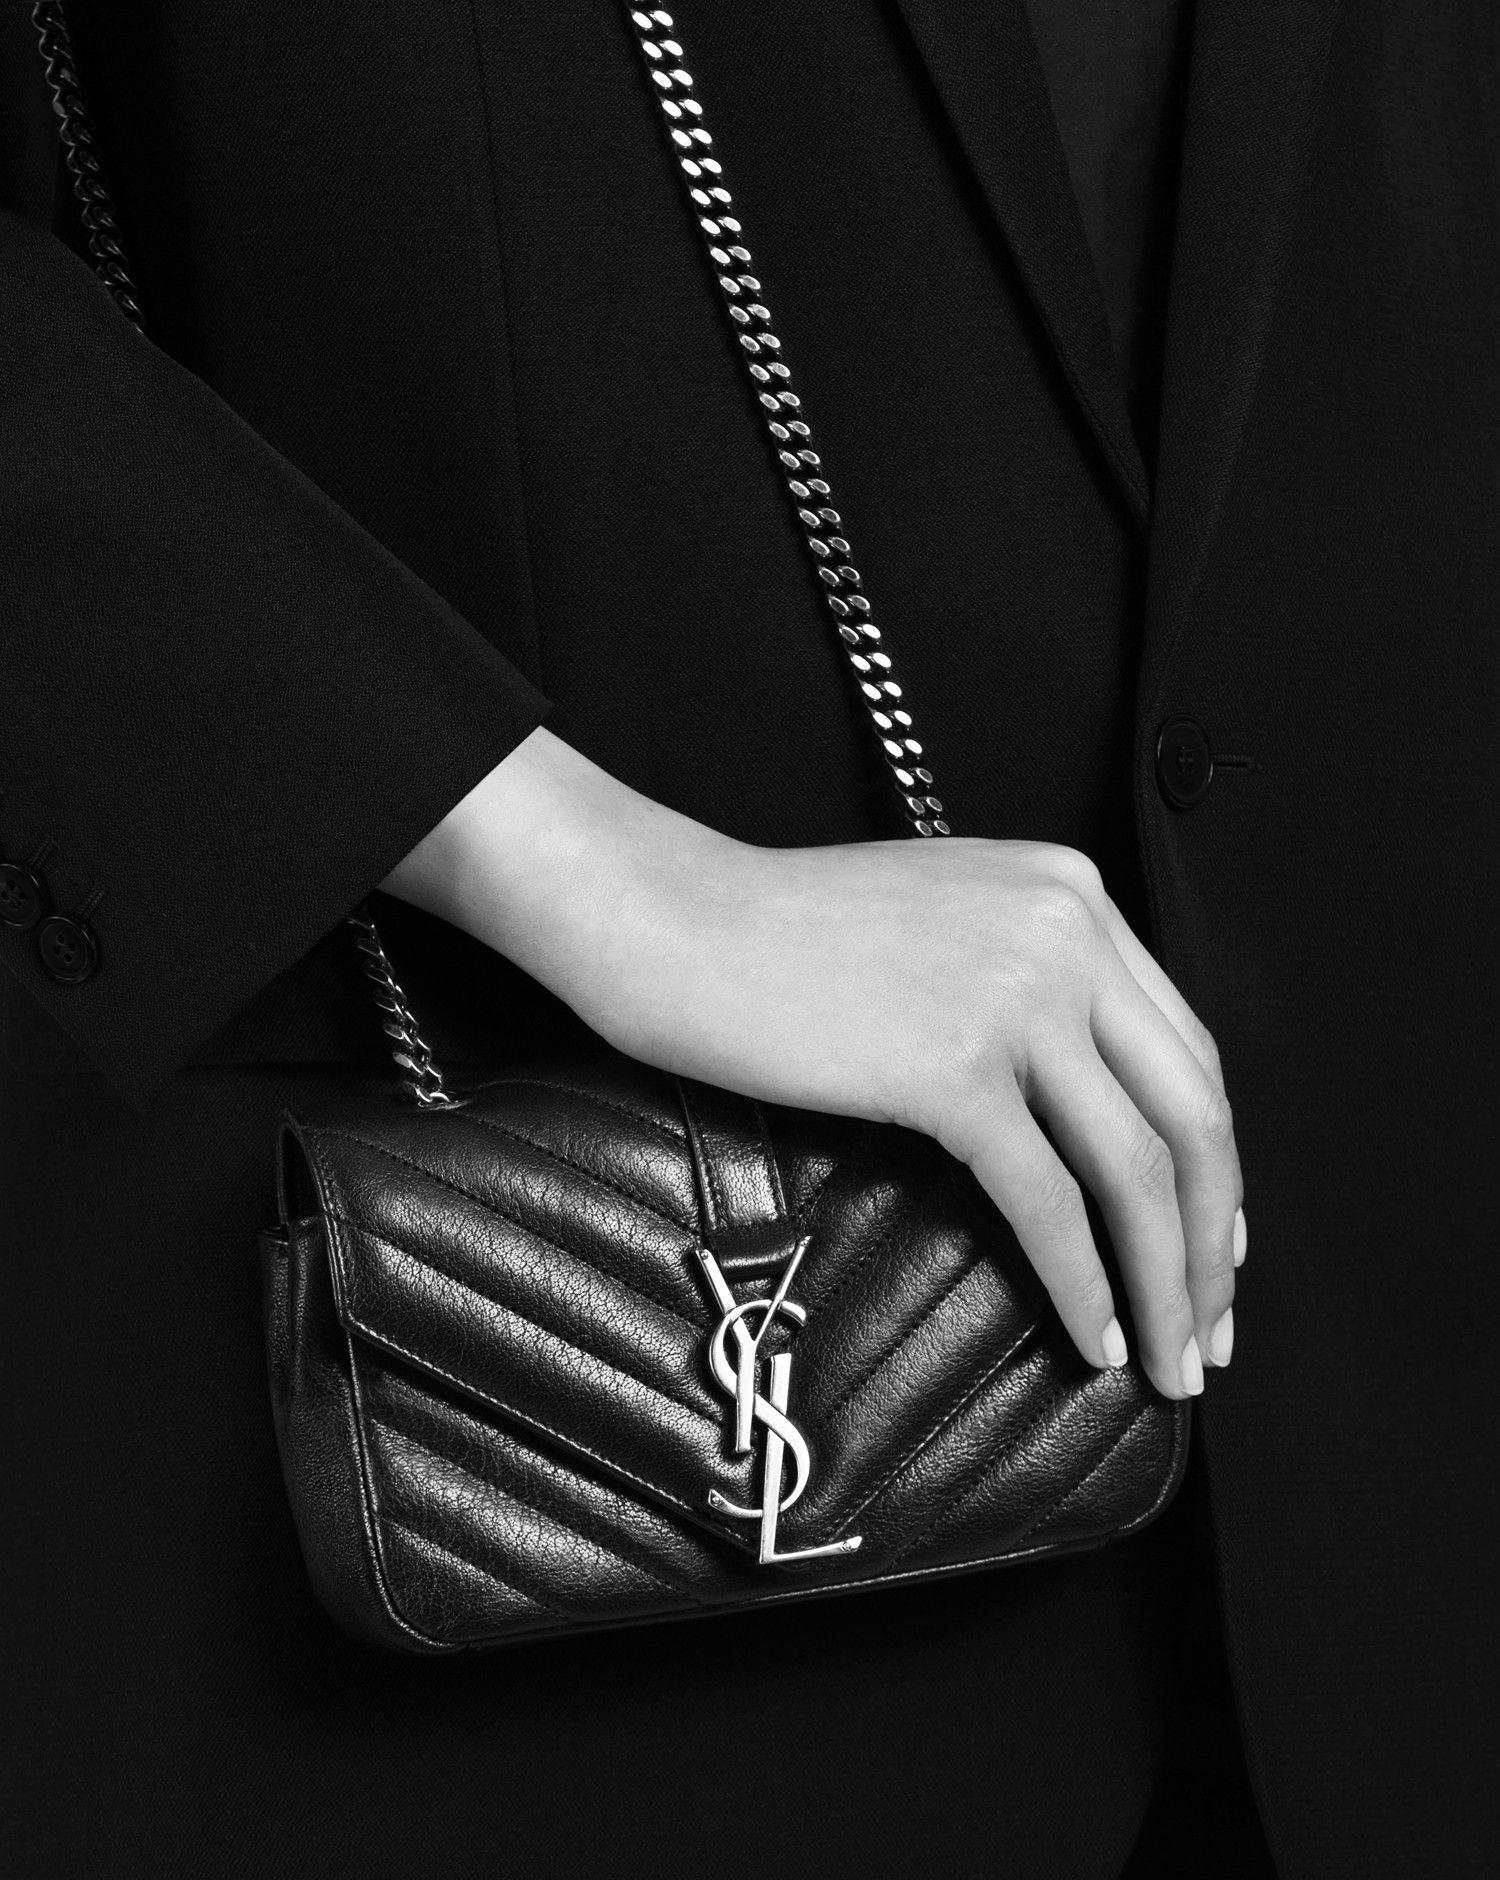 Saint Laurent CLASSIC Baby MONOGRAM SAINT LAURENT Chain Bag In Black Matelassé  Leather   YSL.com 7ef06f0614